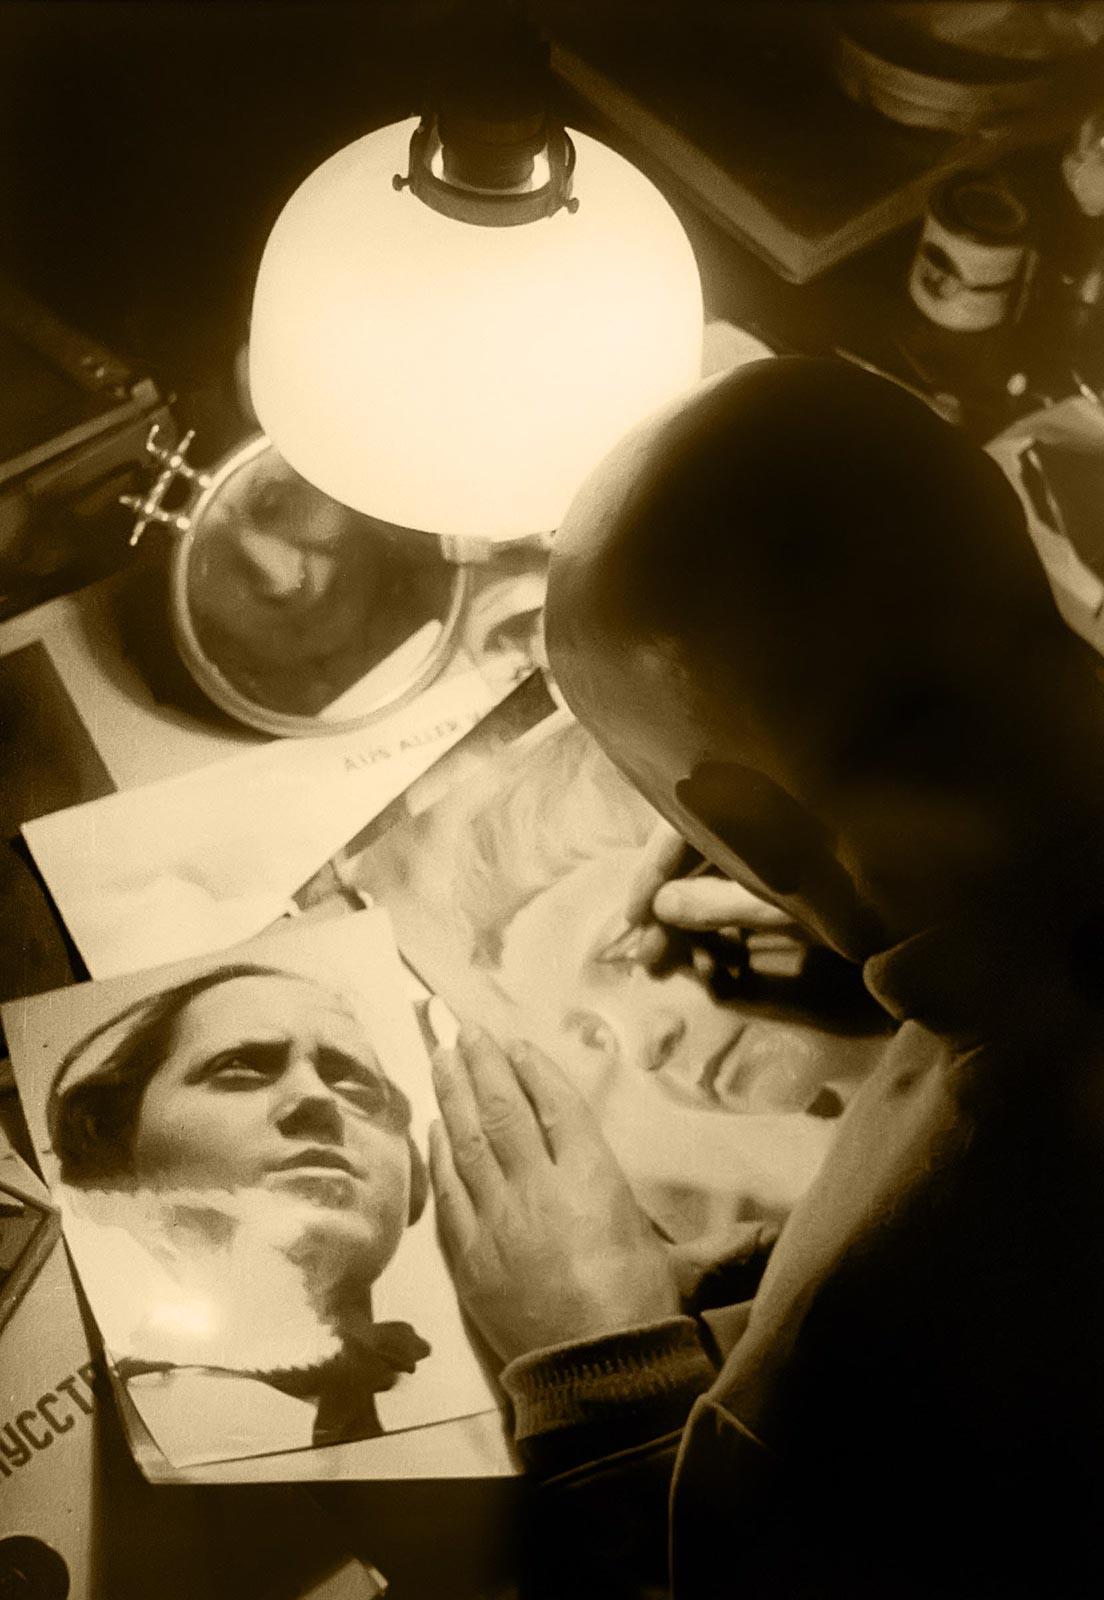 Фото №179257. Анатолий Скурихин. Александр Родченко ретуширует отпечатки. 1934